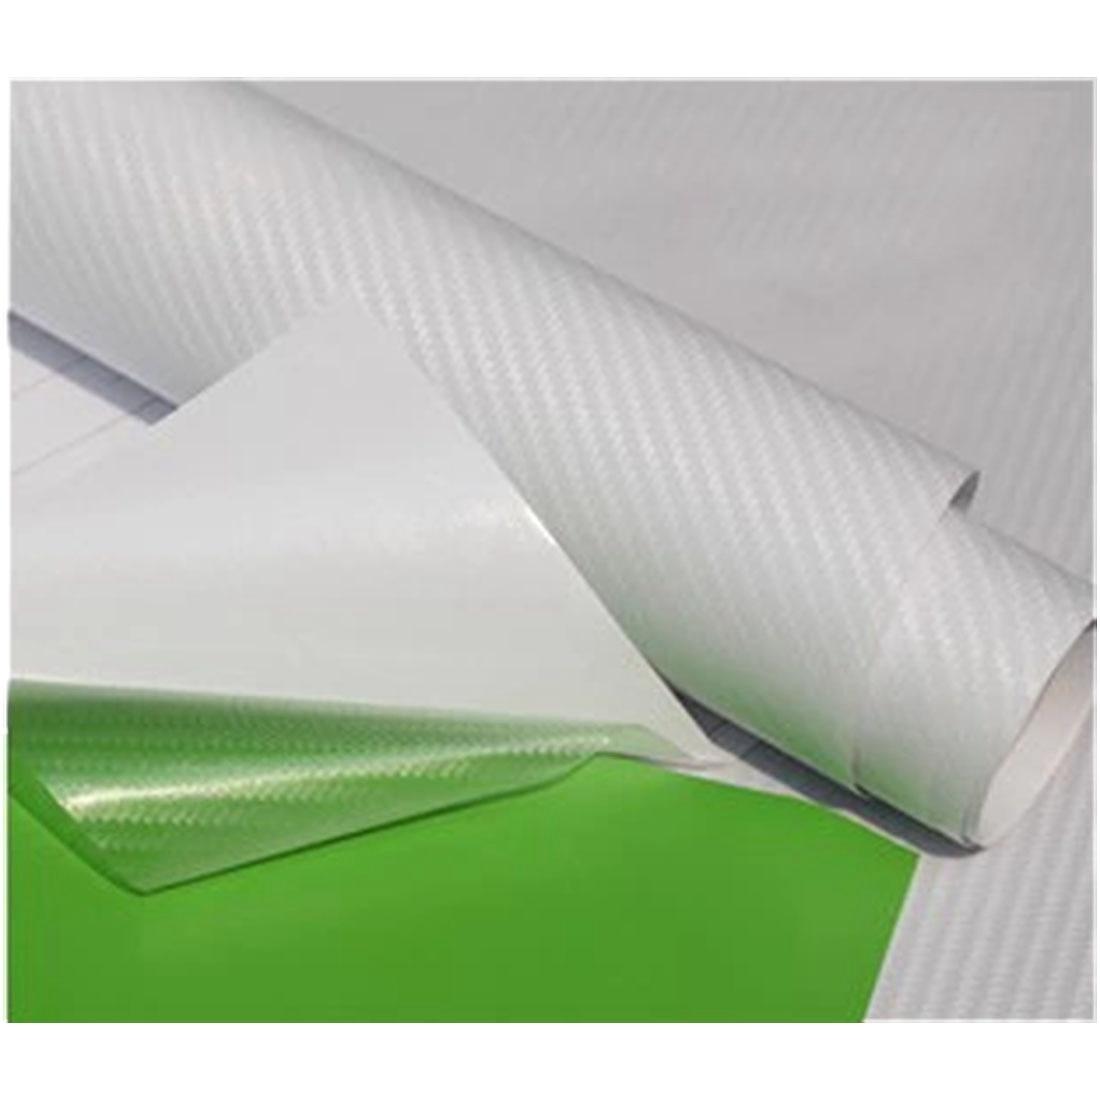 *3D Carbon Fiber Clear Transparent Vinyl Car Wrap Sticker Decal Film Sheet DIY